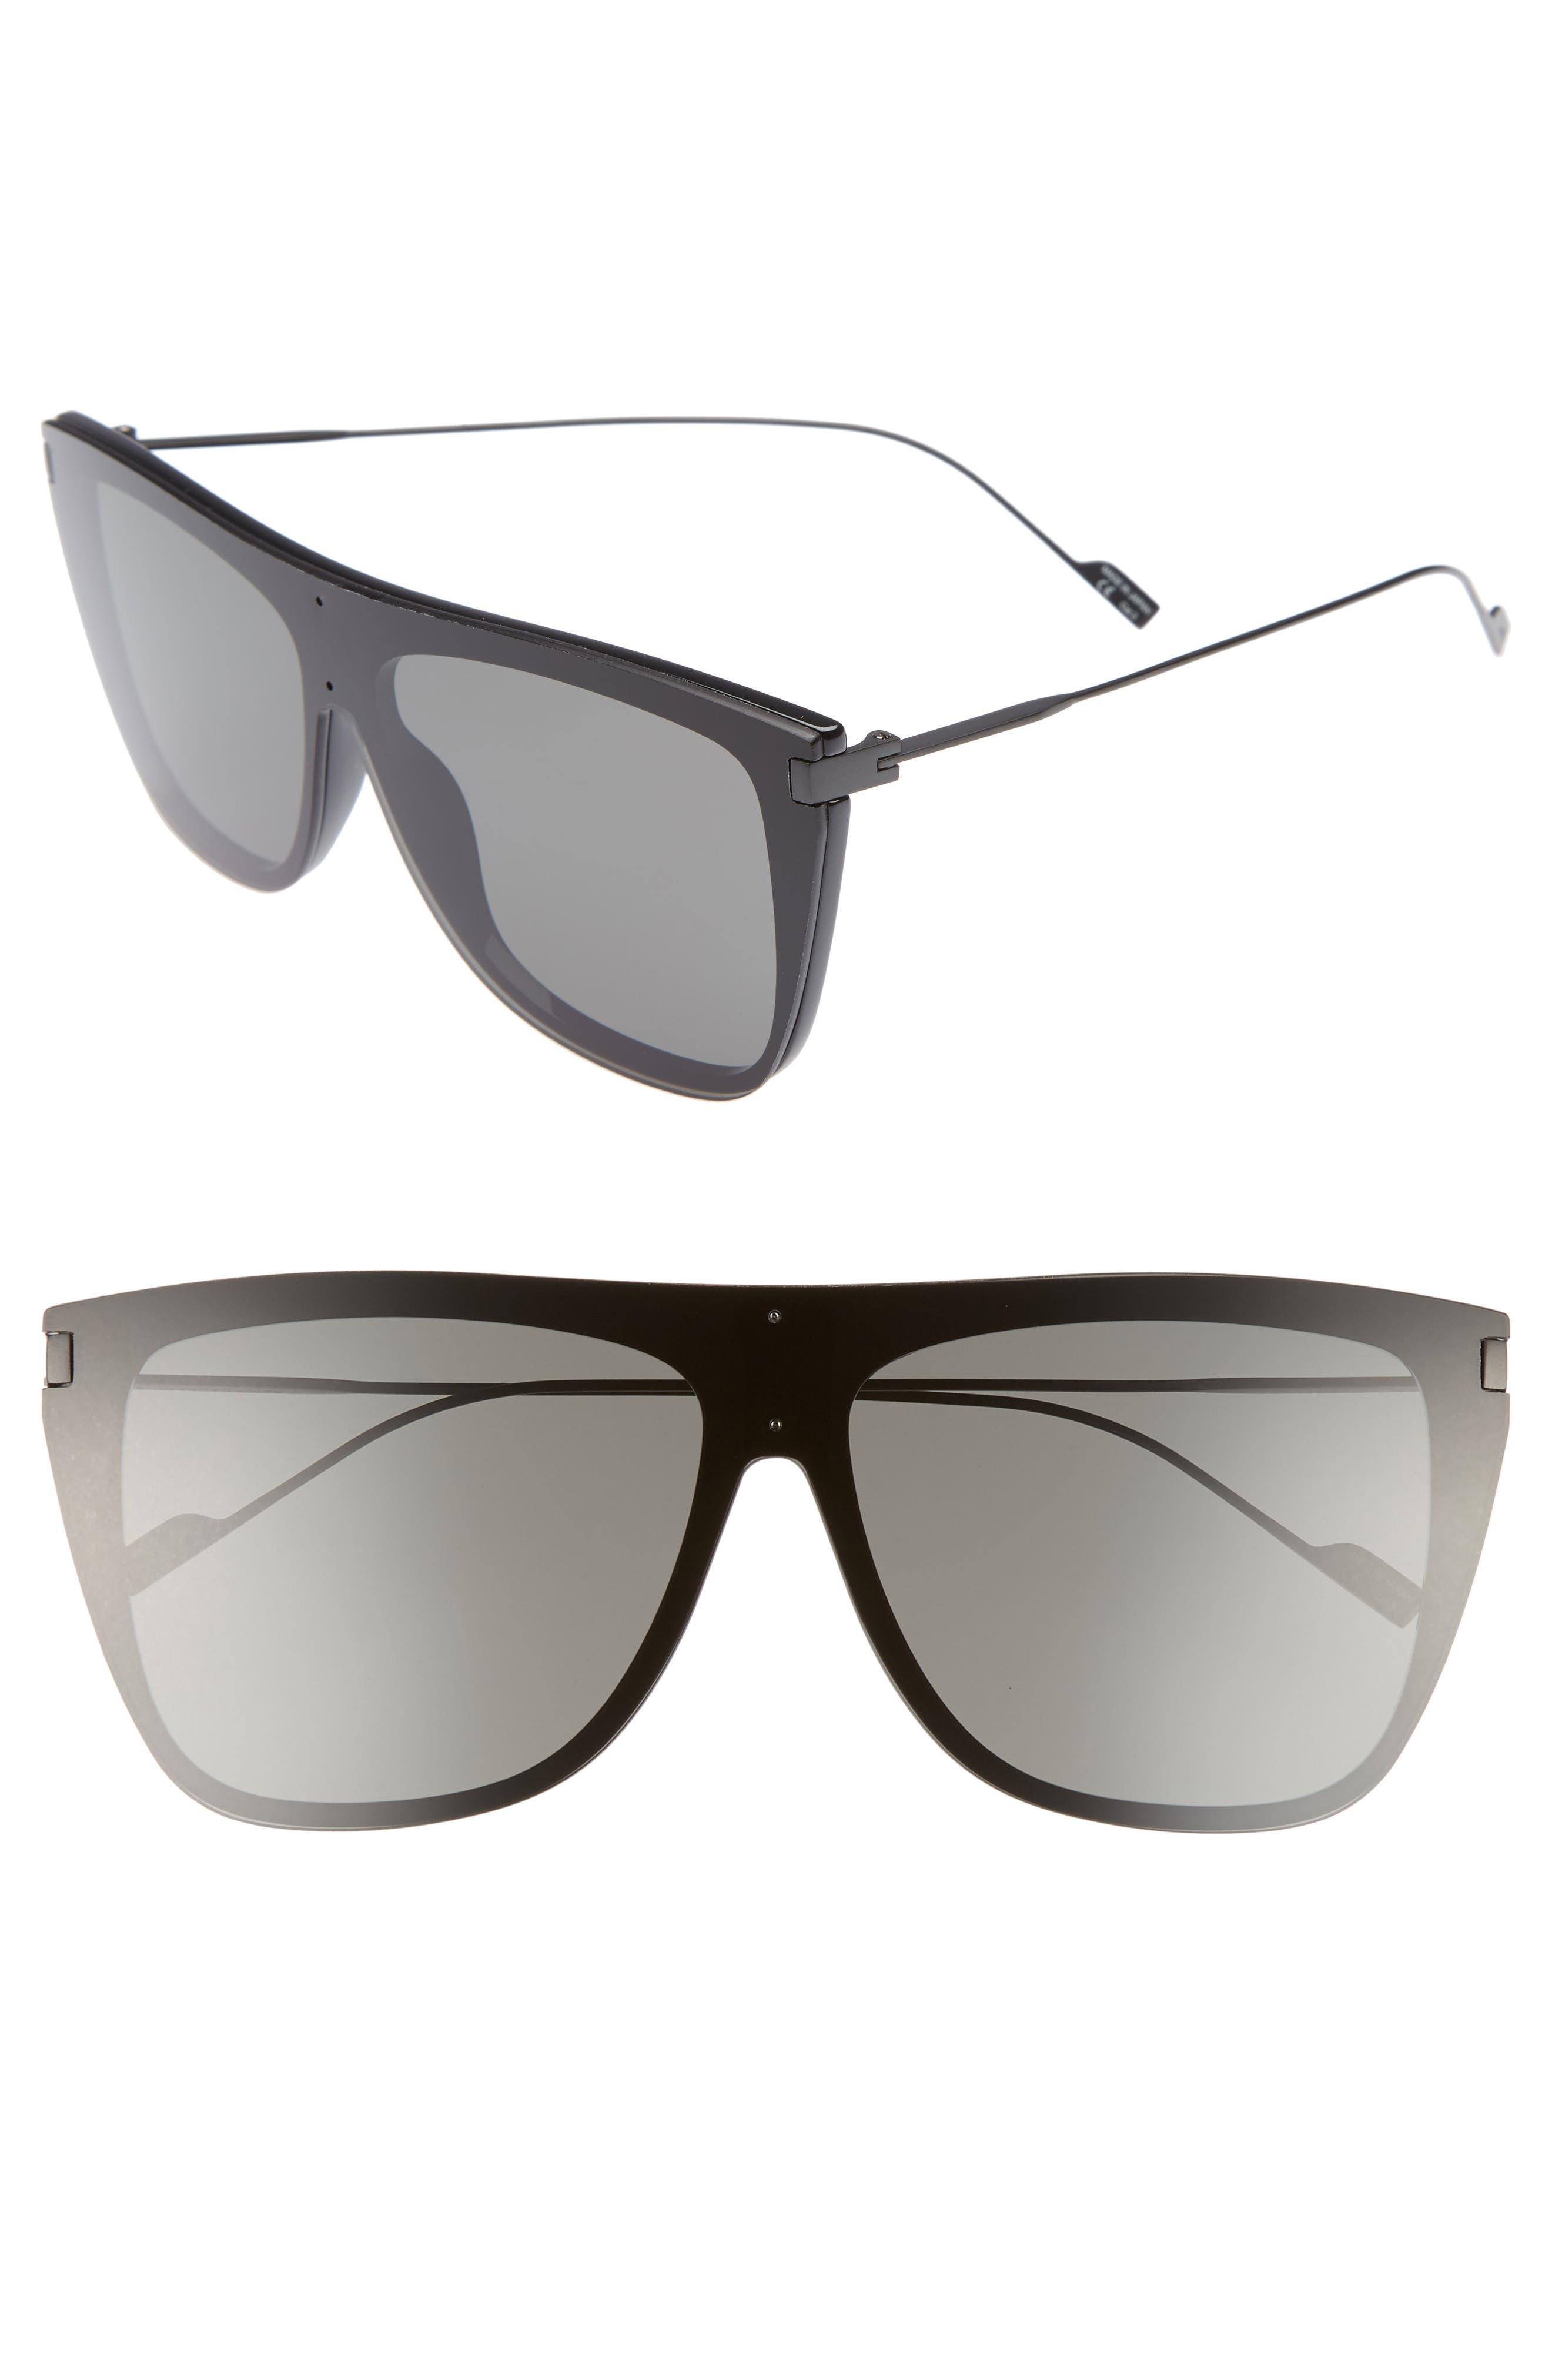 SAINT LAURENT,                             SL 1 T 59mm Flat Top Sunglasses,                             Main thumbnail 1, color,                             BLACK